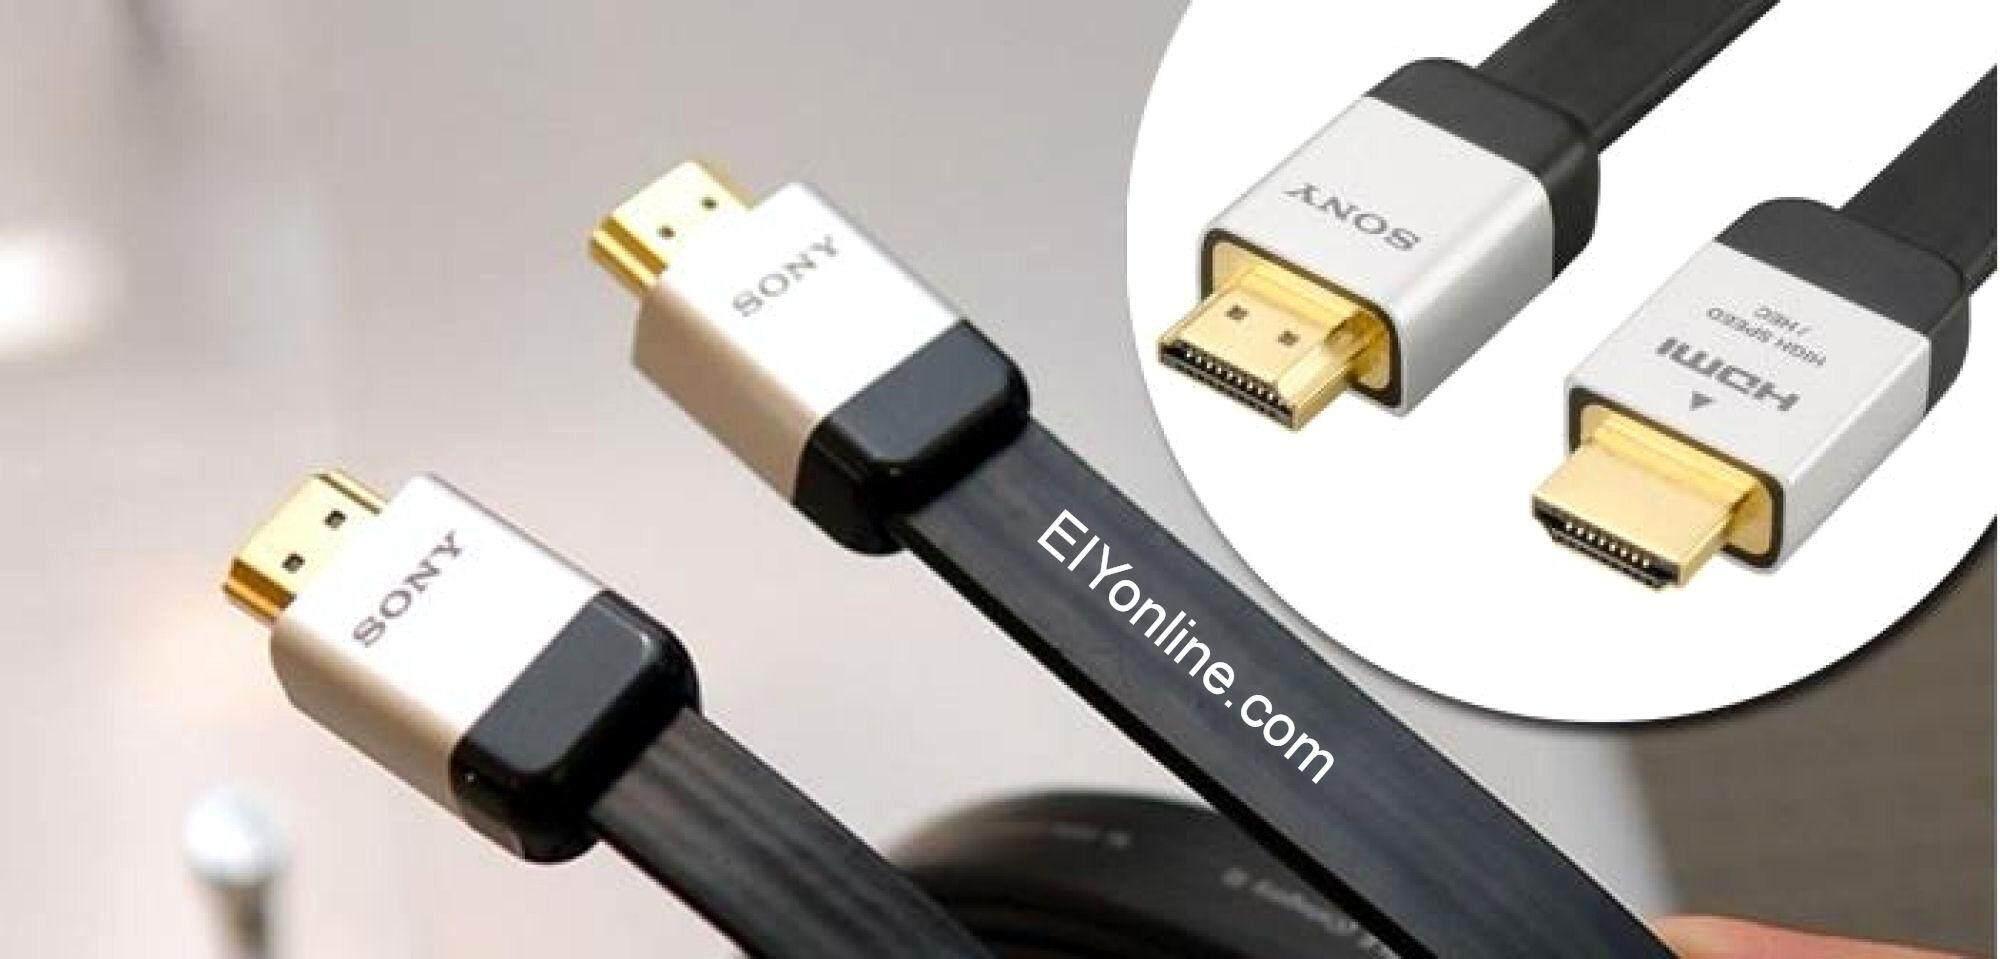 Fitur Sony Hdmi Gold Plated 3d V 1 4 Cable 2m Dan Harga Terbaru 2meter V14